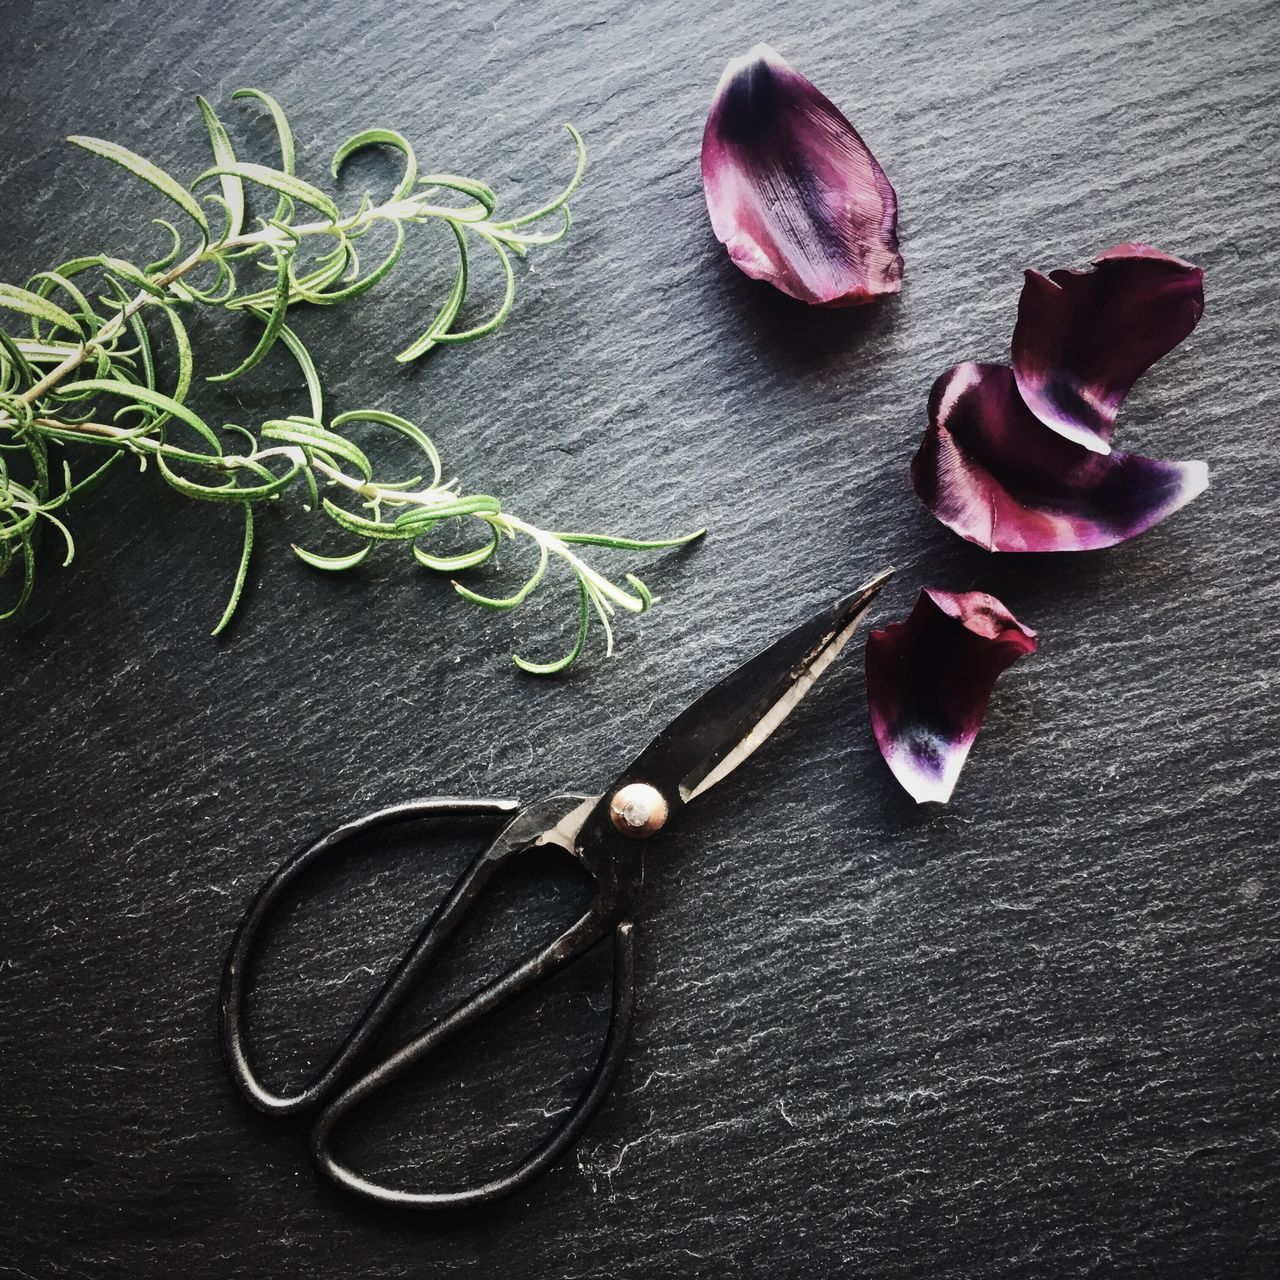 Close-up Plant Table Leaf Still Life Food And Drink Darkbackground Studio Shot Kitchen Foodstyling